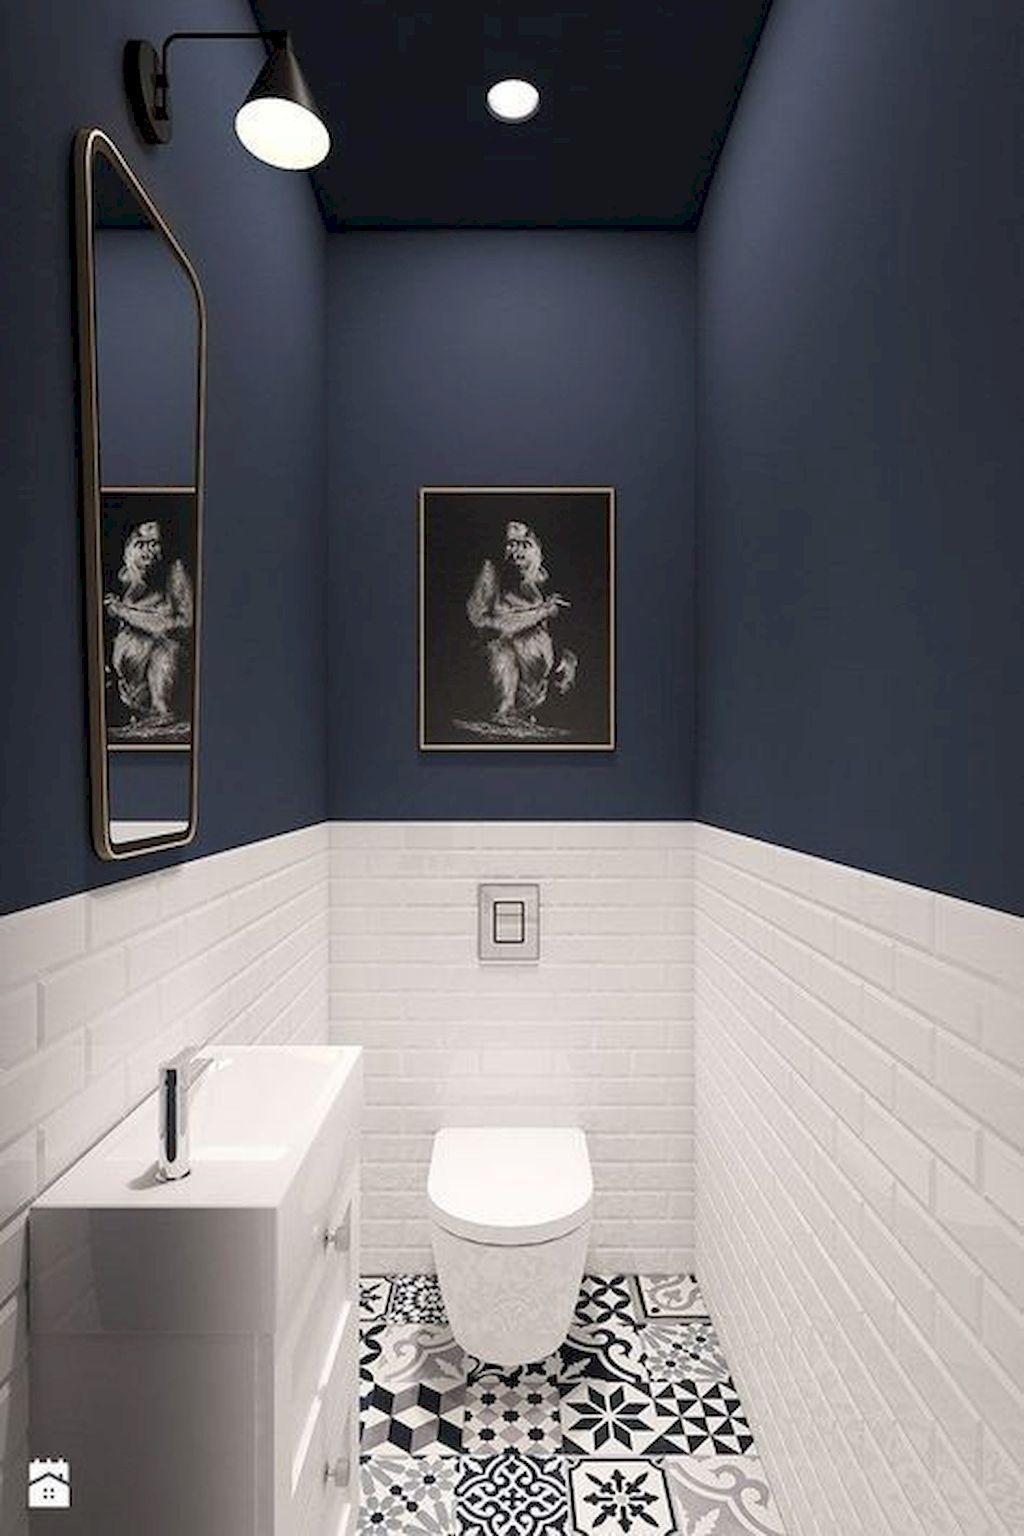 Bathroom With Retro Tiled Flooring White Bathroom Designs Small Bathroom Remodel Small Bathroom